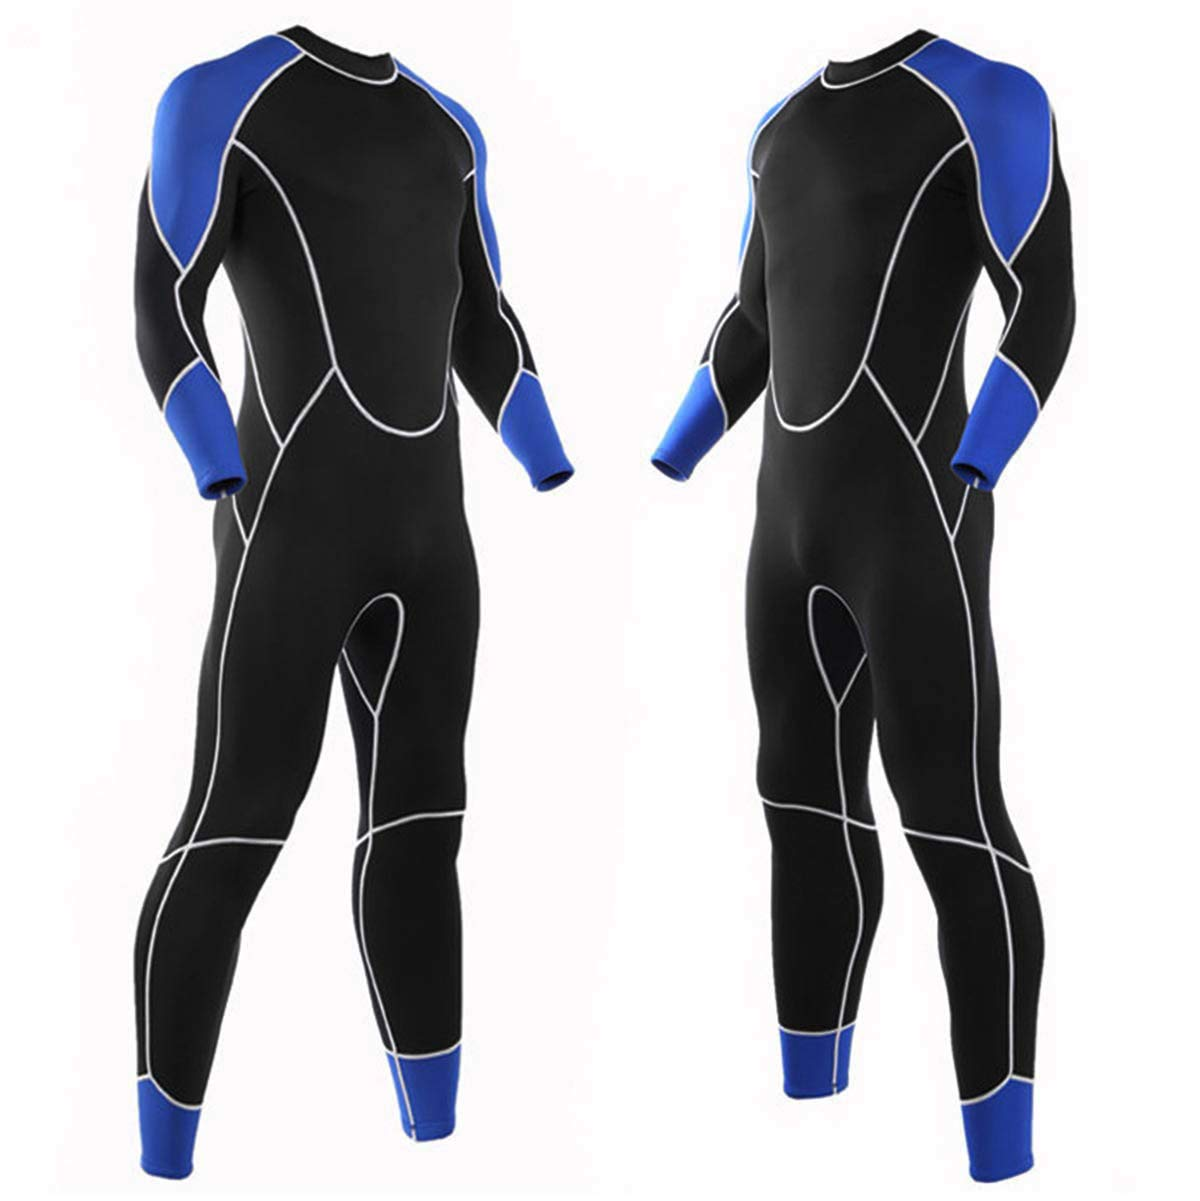 Niiwi Men Full Wetsuit - 2.5mm Premium Neoprene Diving Suit Snorkeling Surfing Jumpsuit (Blue/Black, M)